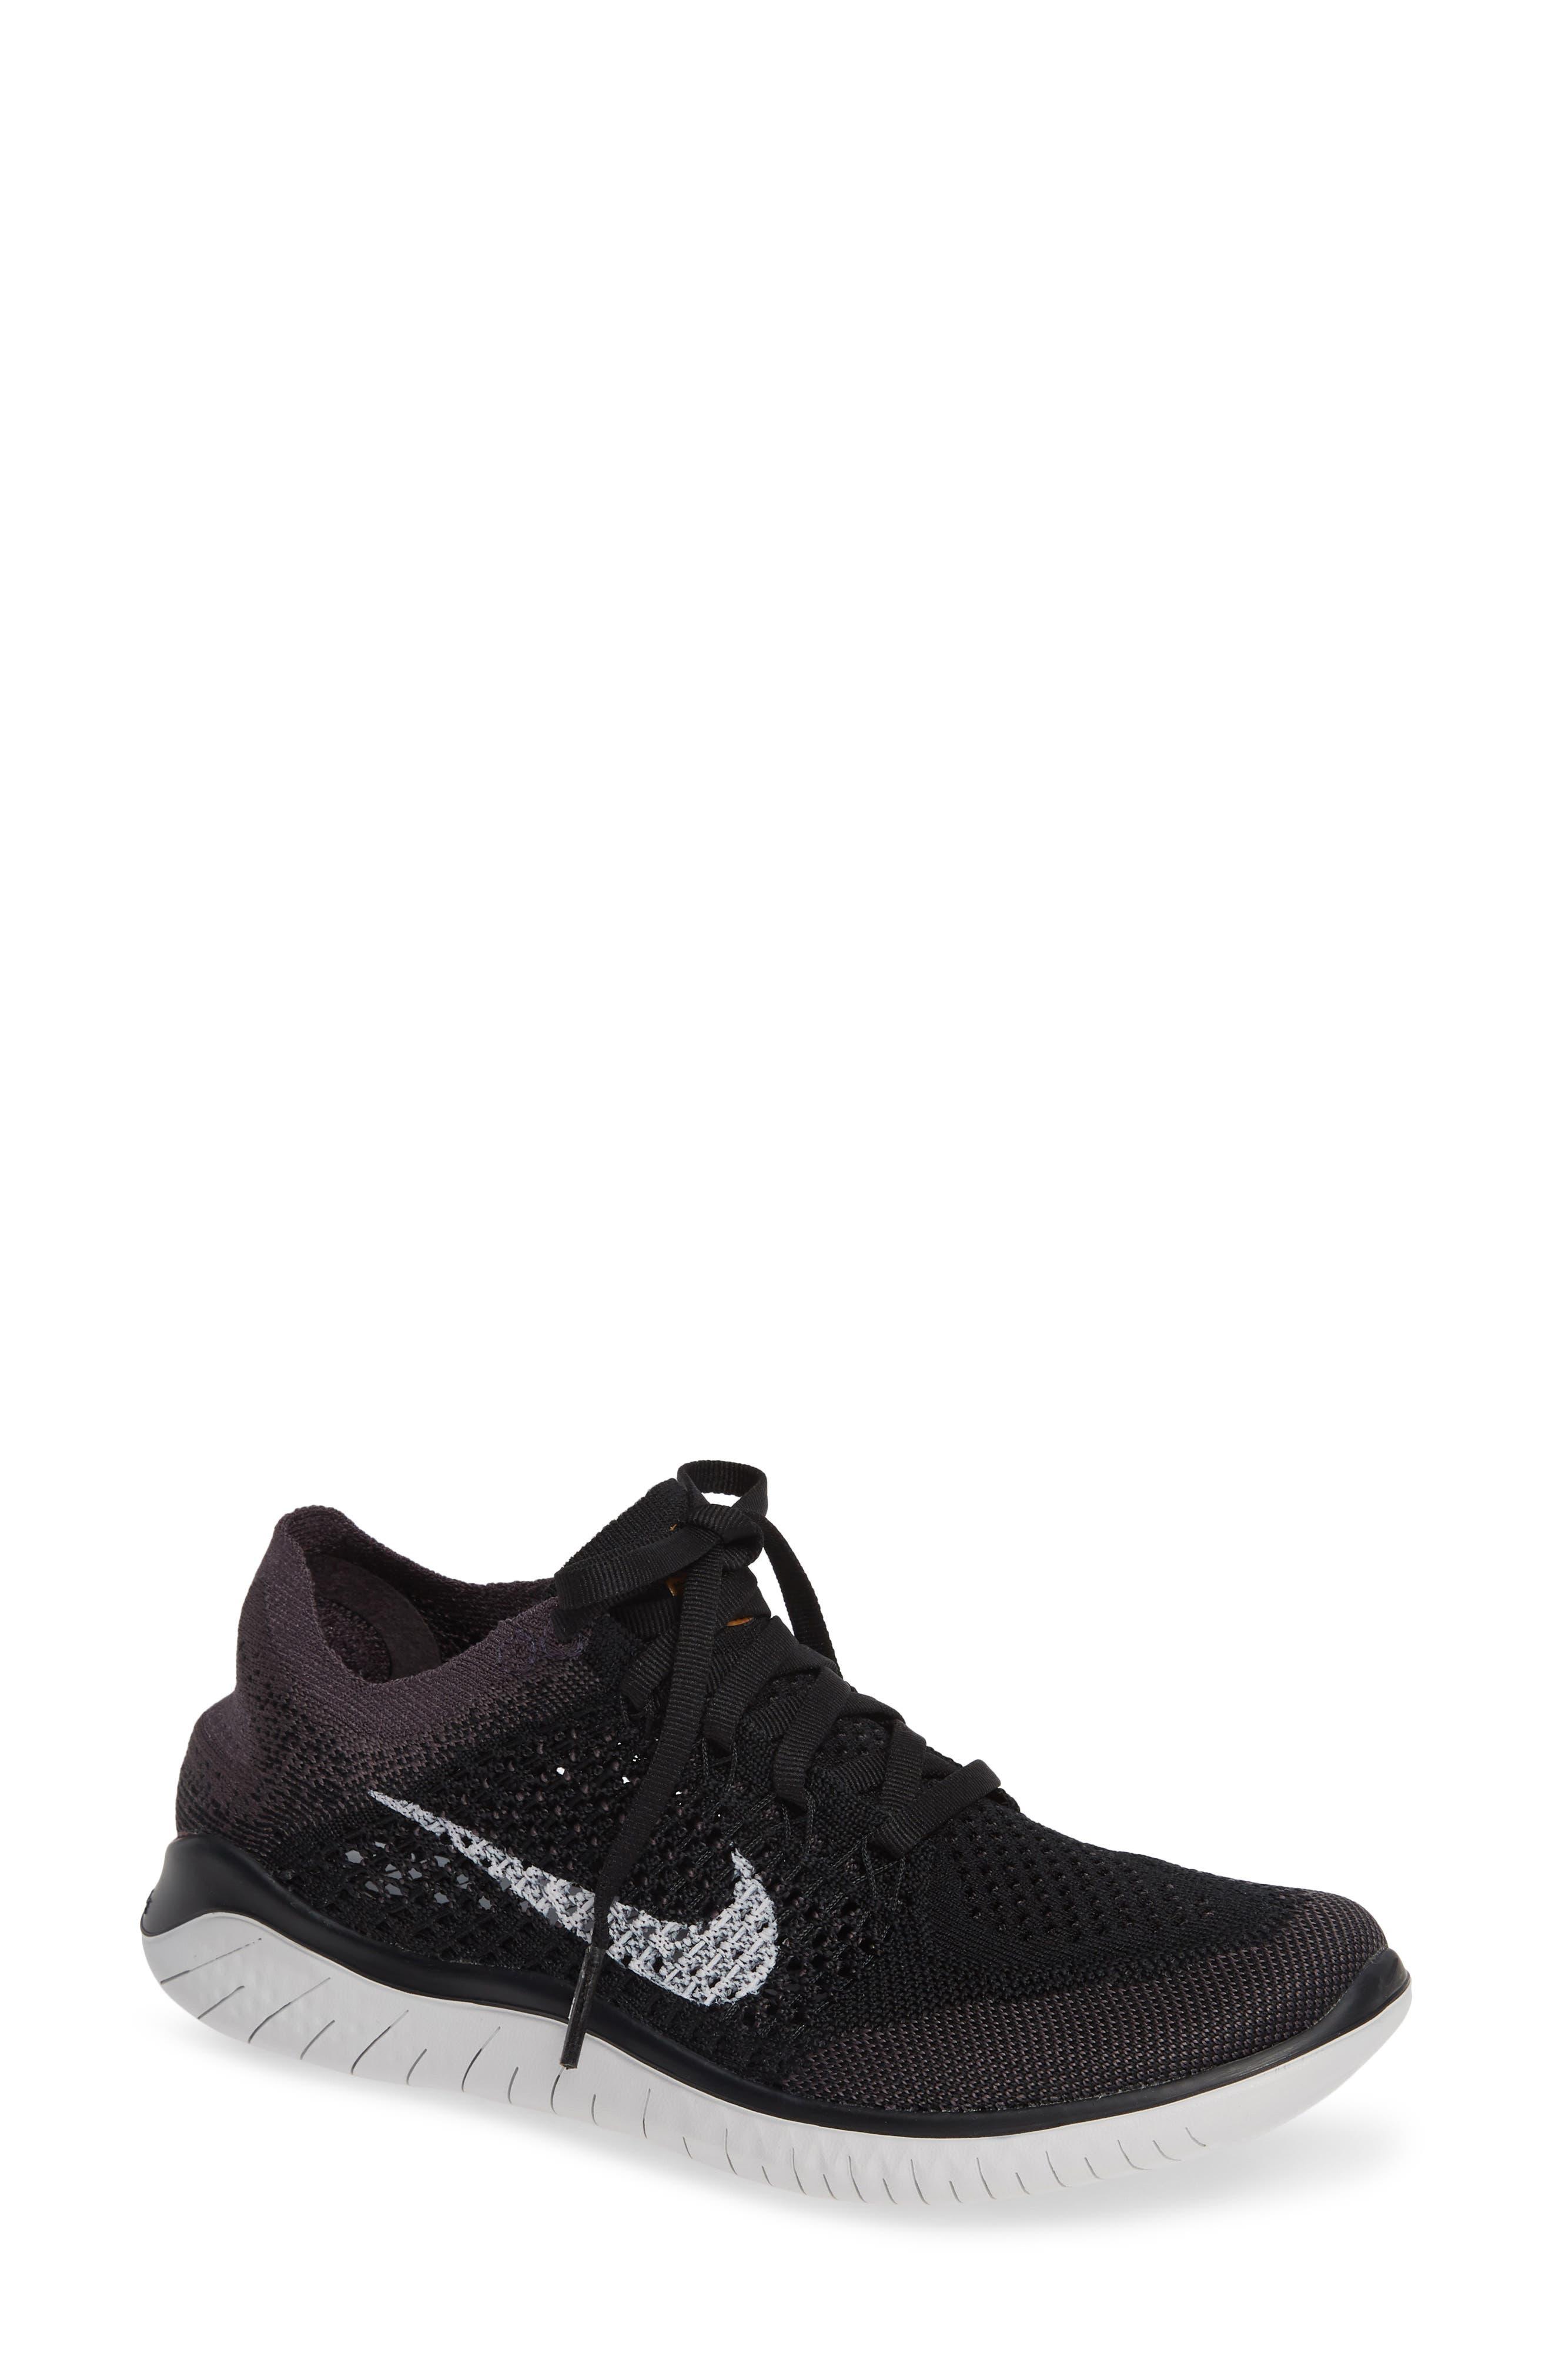 NIKE Free RN Flyknit 2018 Running Shoe, Main, color, BLACK/ VAST GREY/ GOLD